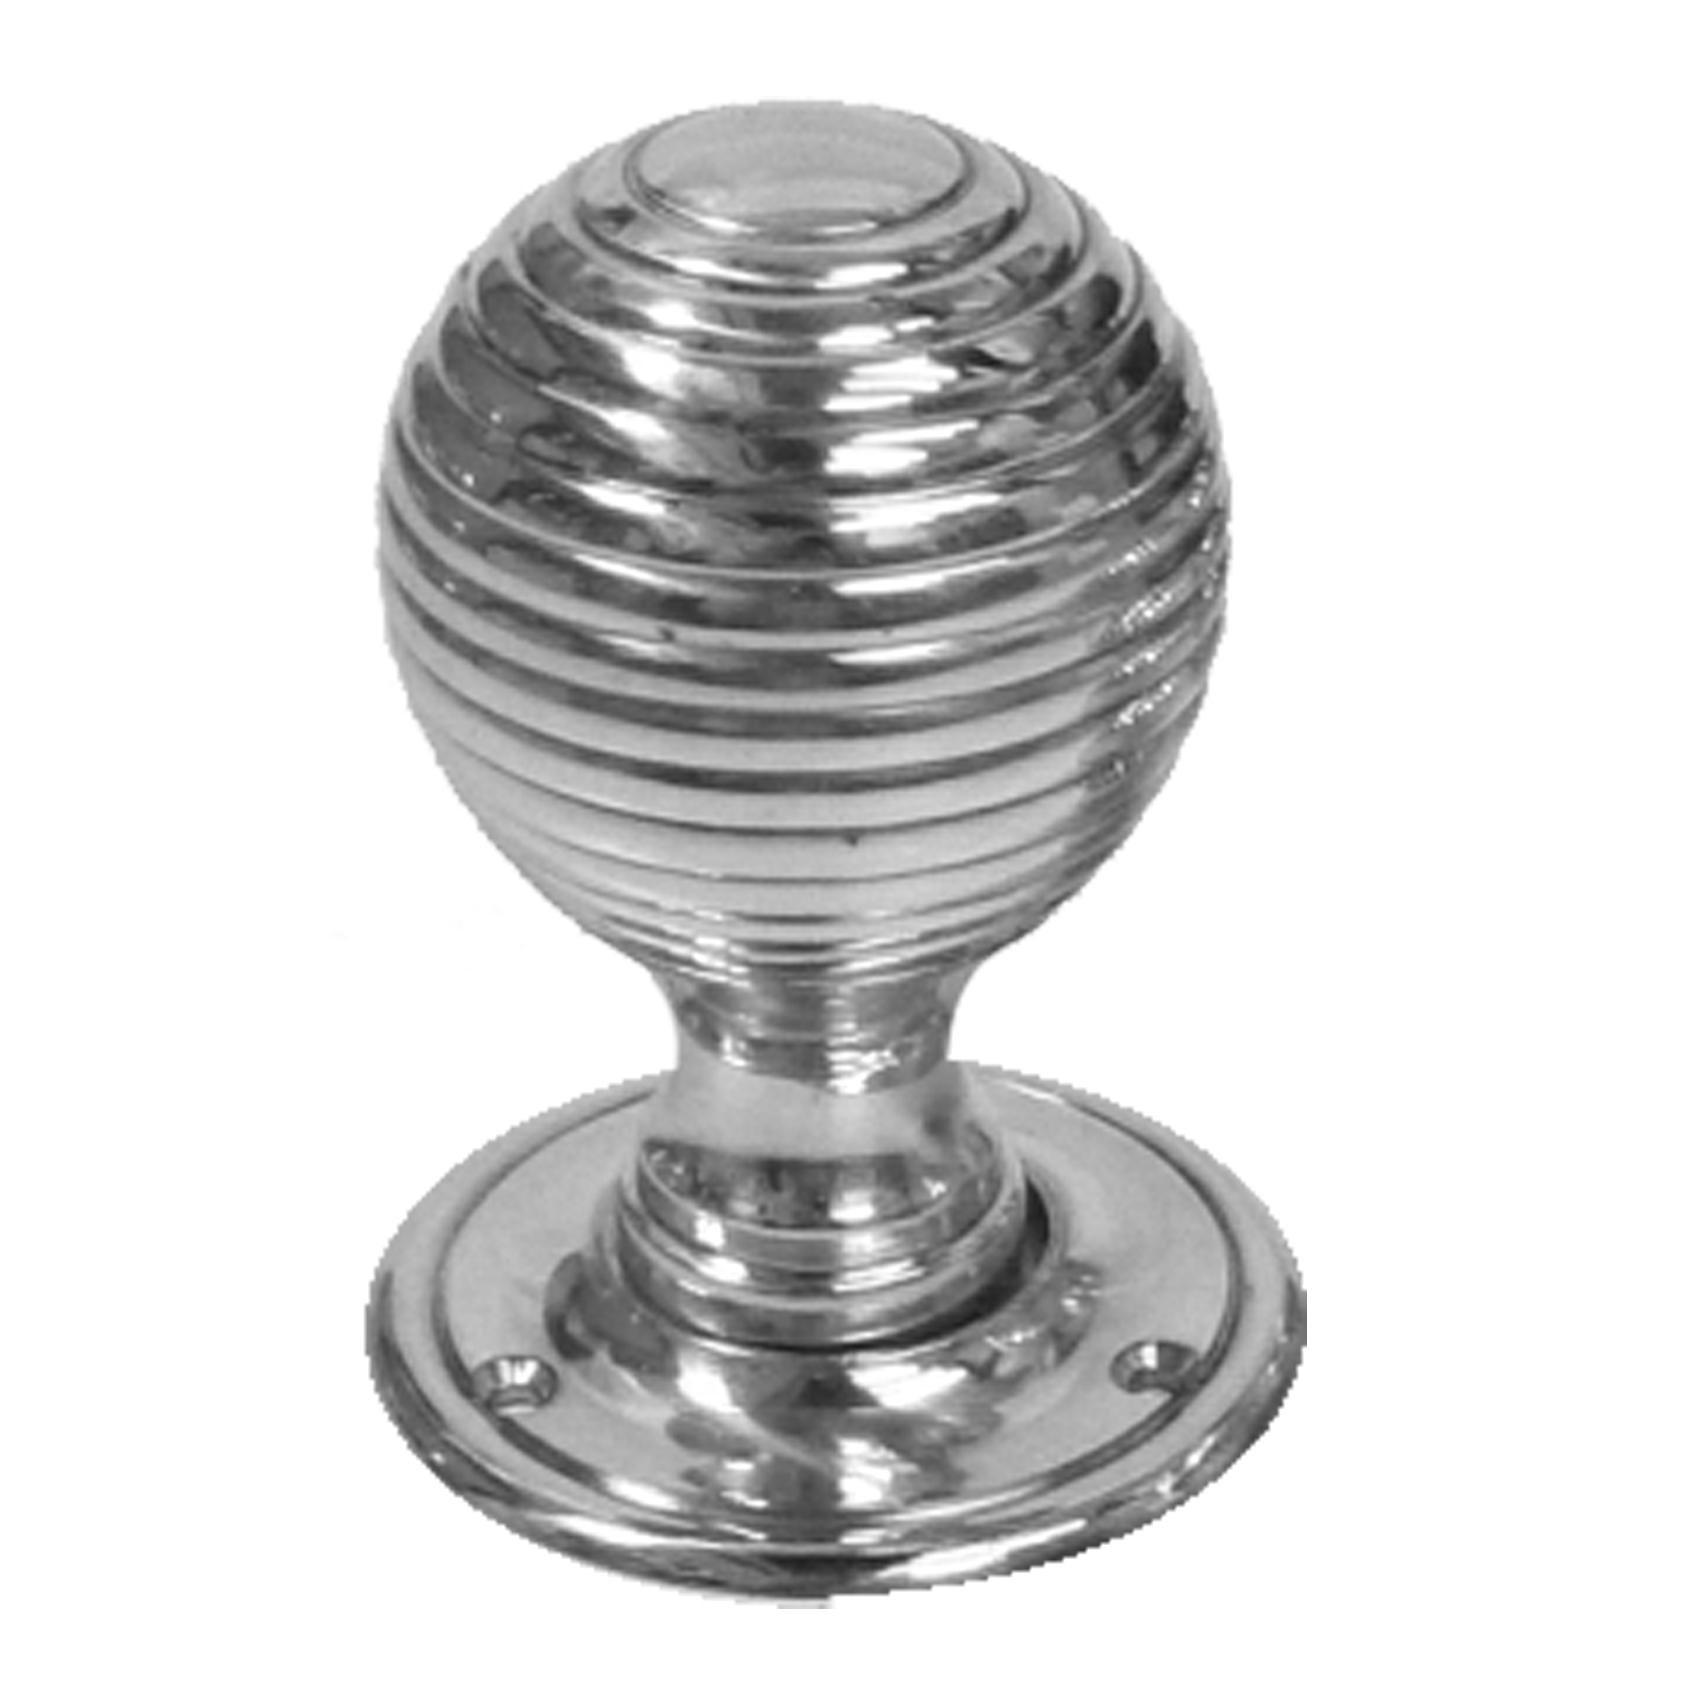 Classic Chrome Beehive Doorknobs